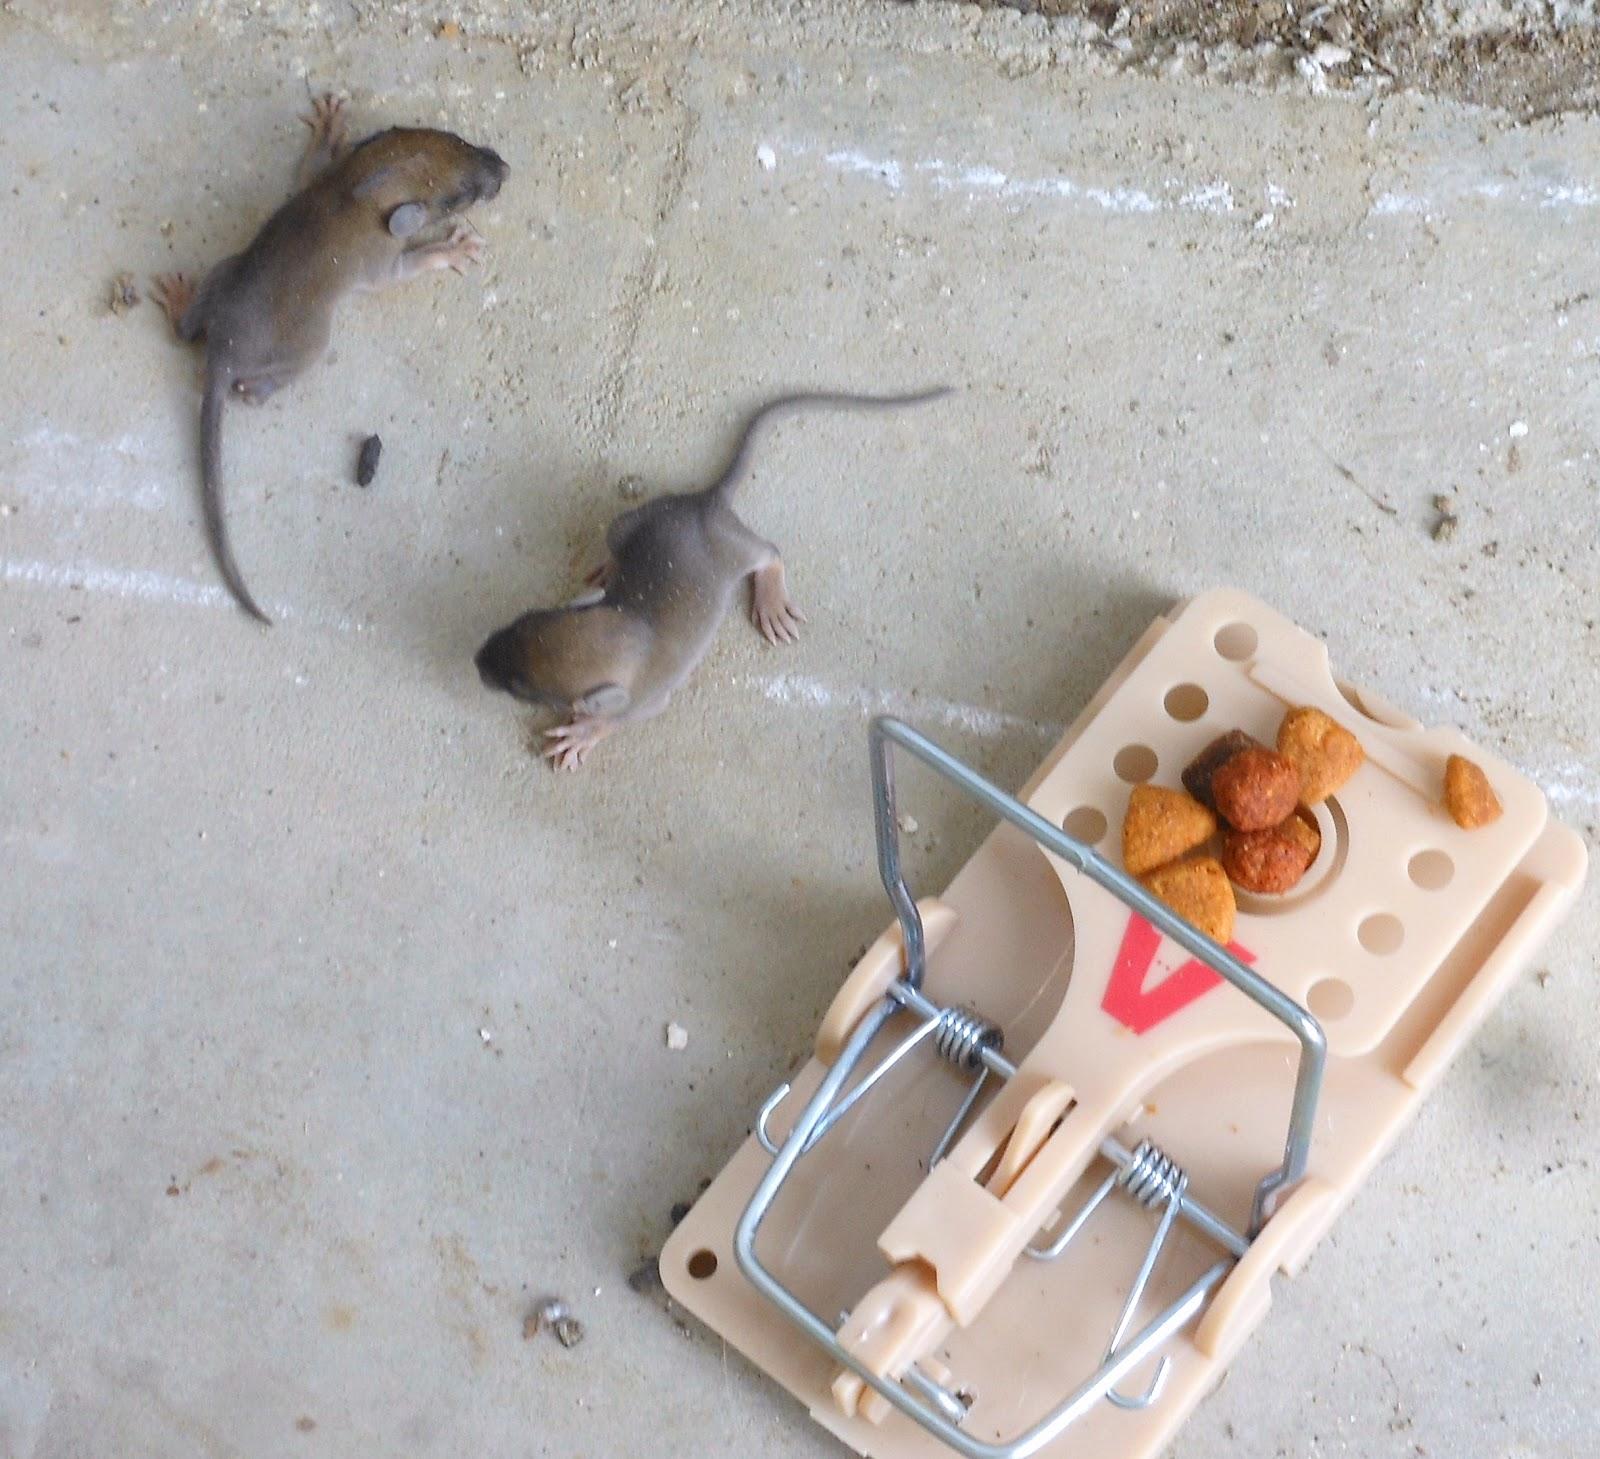 Days 580 584 victoria park john anson ford park rats